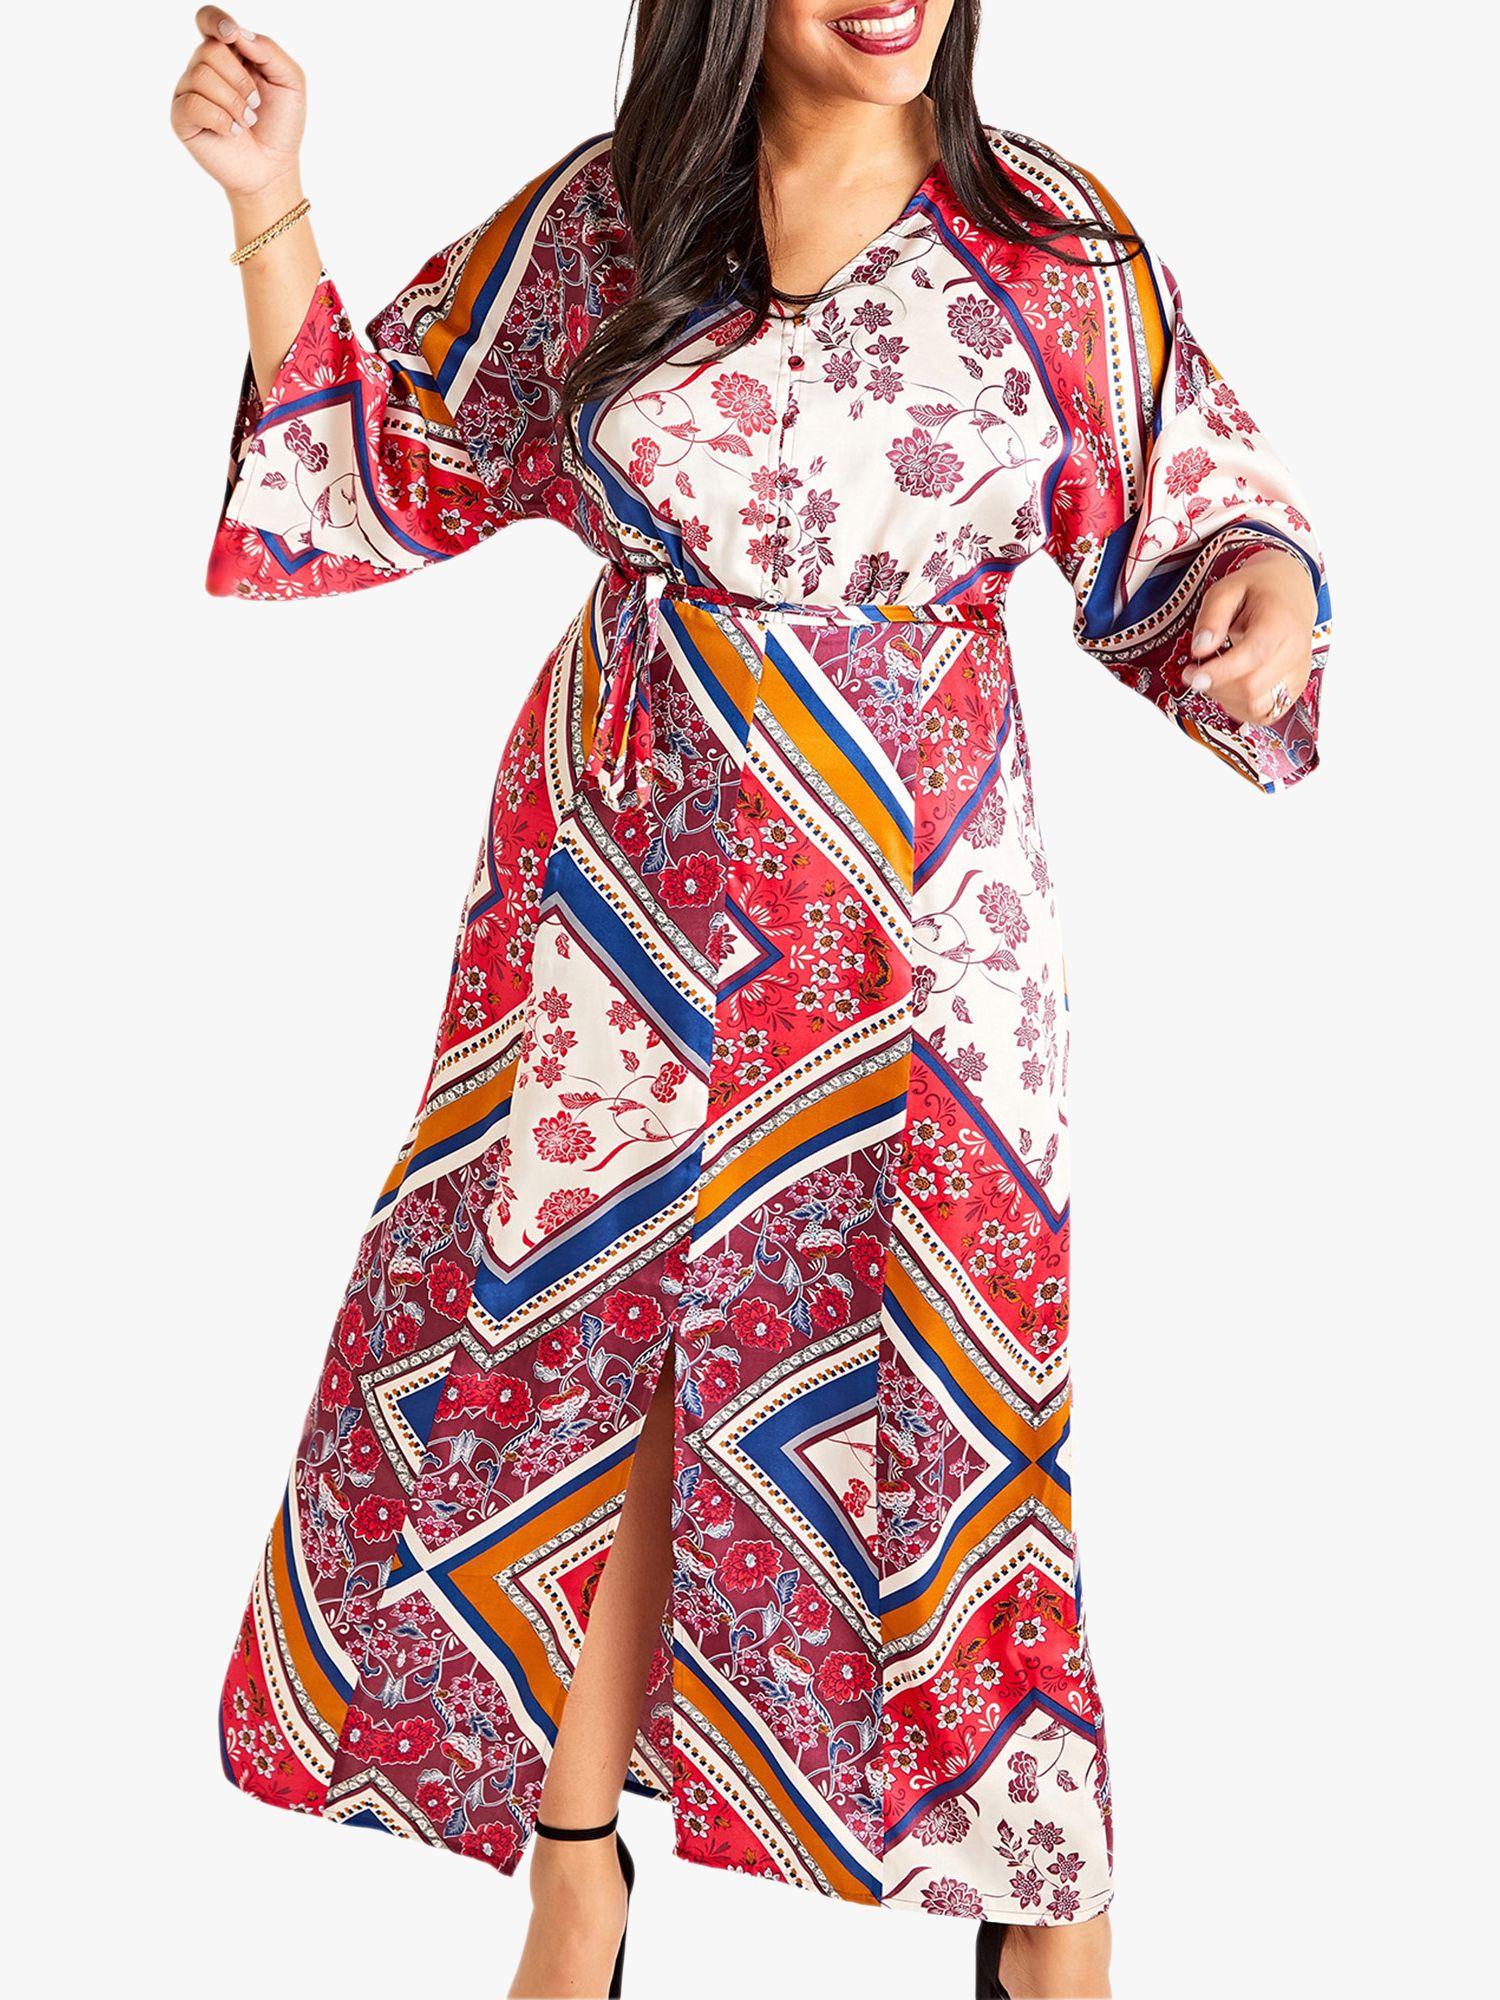 Yumi Curves Yumi Curves Scarf Print Dress, Multi